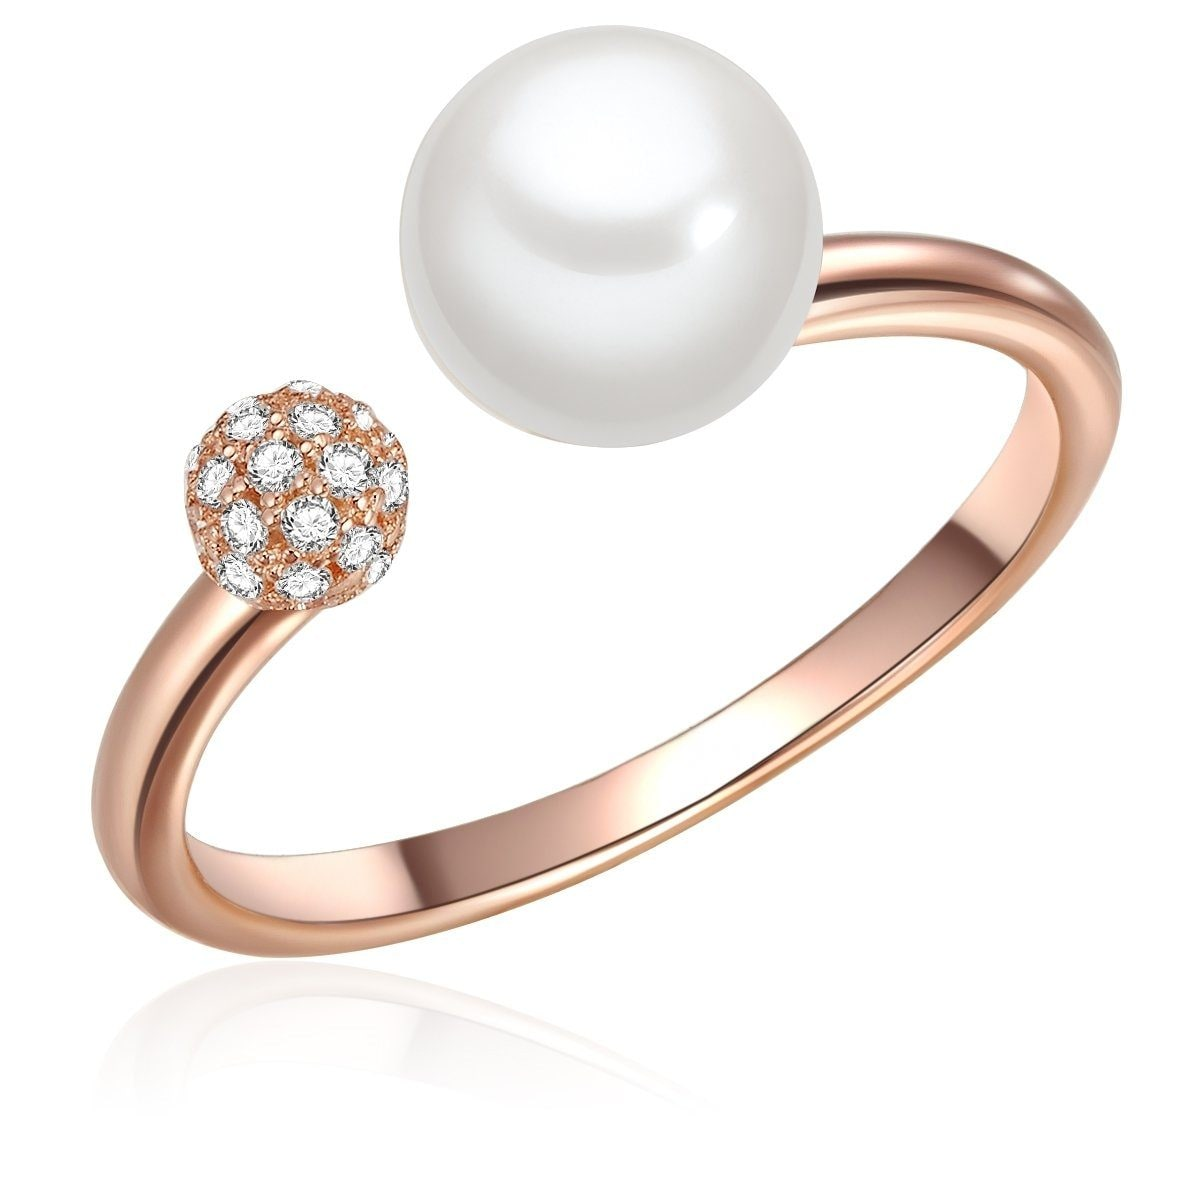 Valero Pearls Perlenring ST113 | Schmuck > Ringe > Perlenringe | Goldfarben | Lüster | Valero Pearls